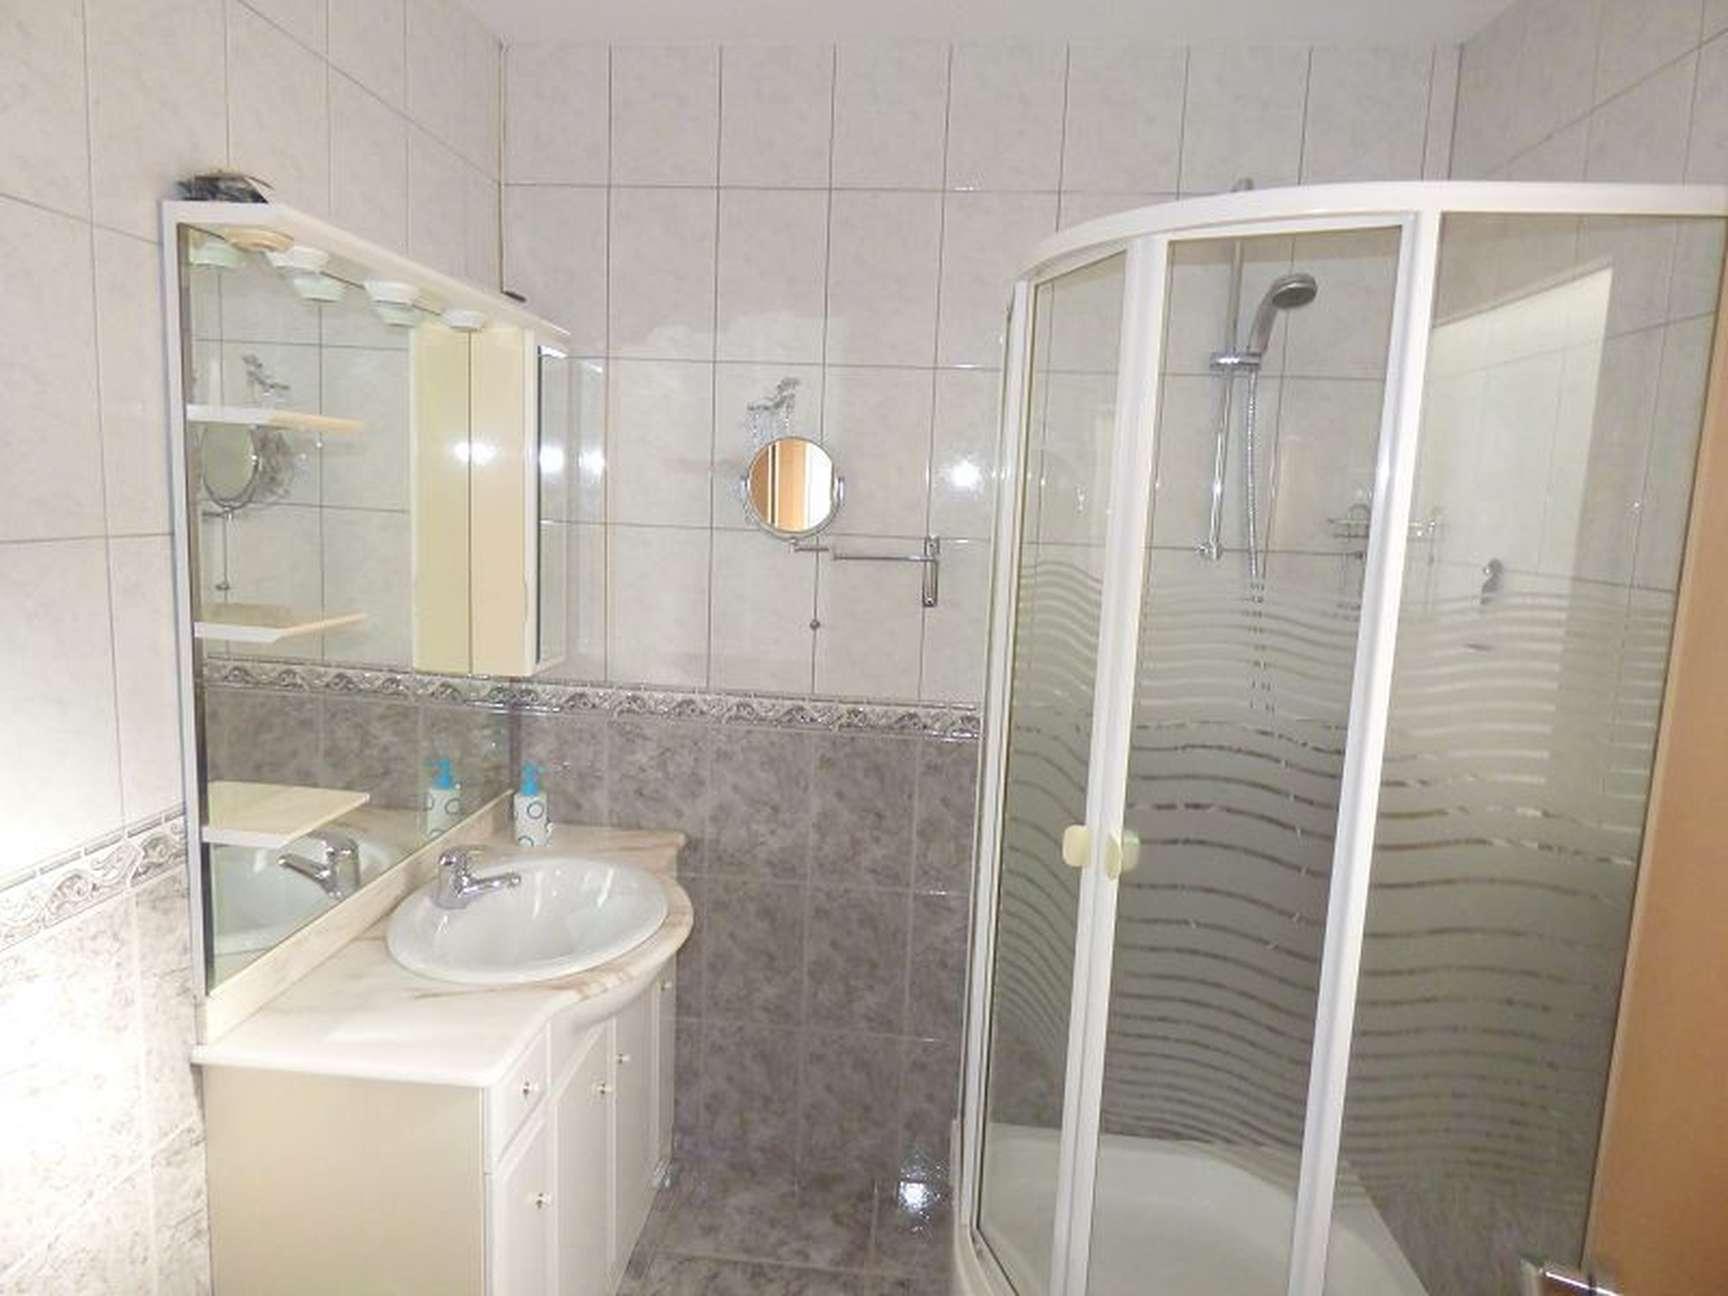 Meuble Salle De Bain Girona vente parfaite villa avec piscine dans un quartier